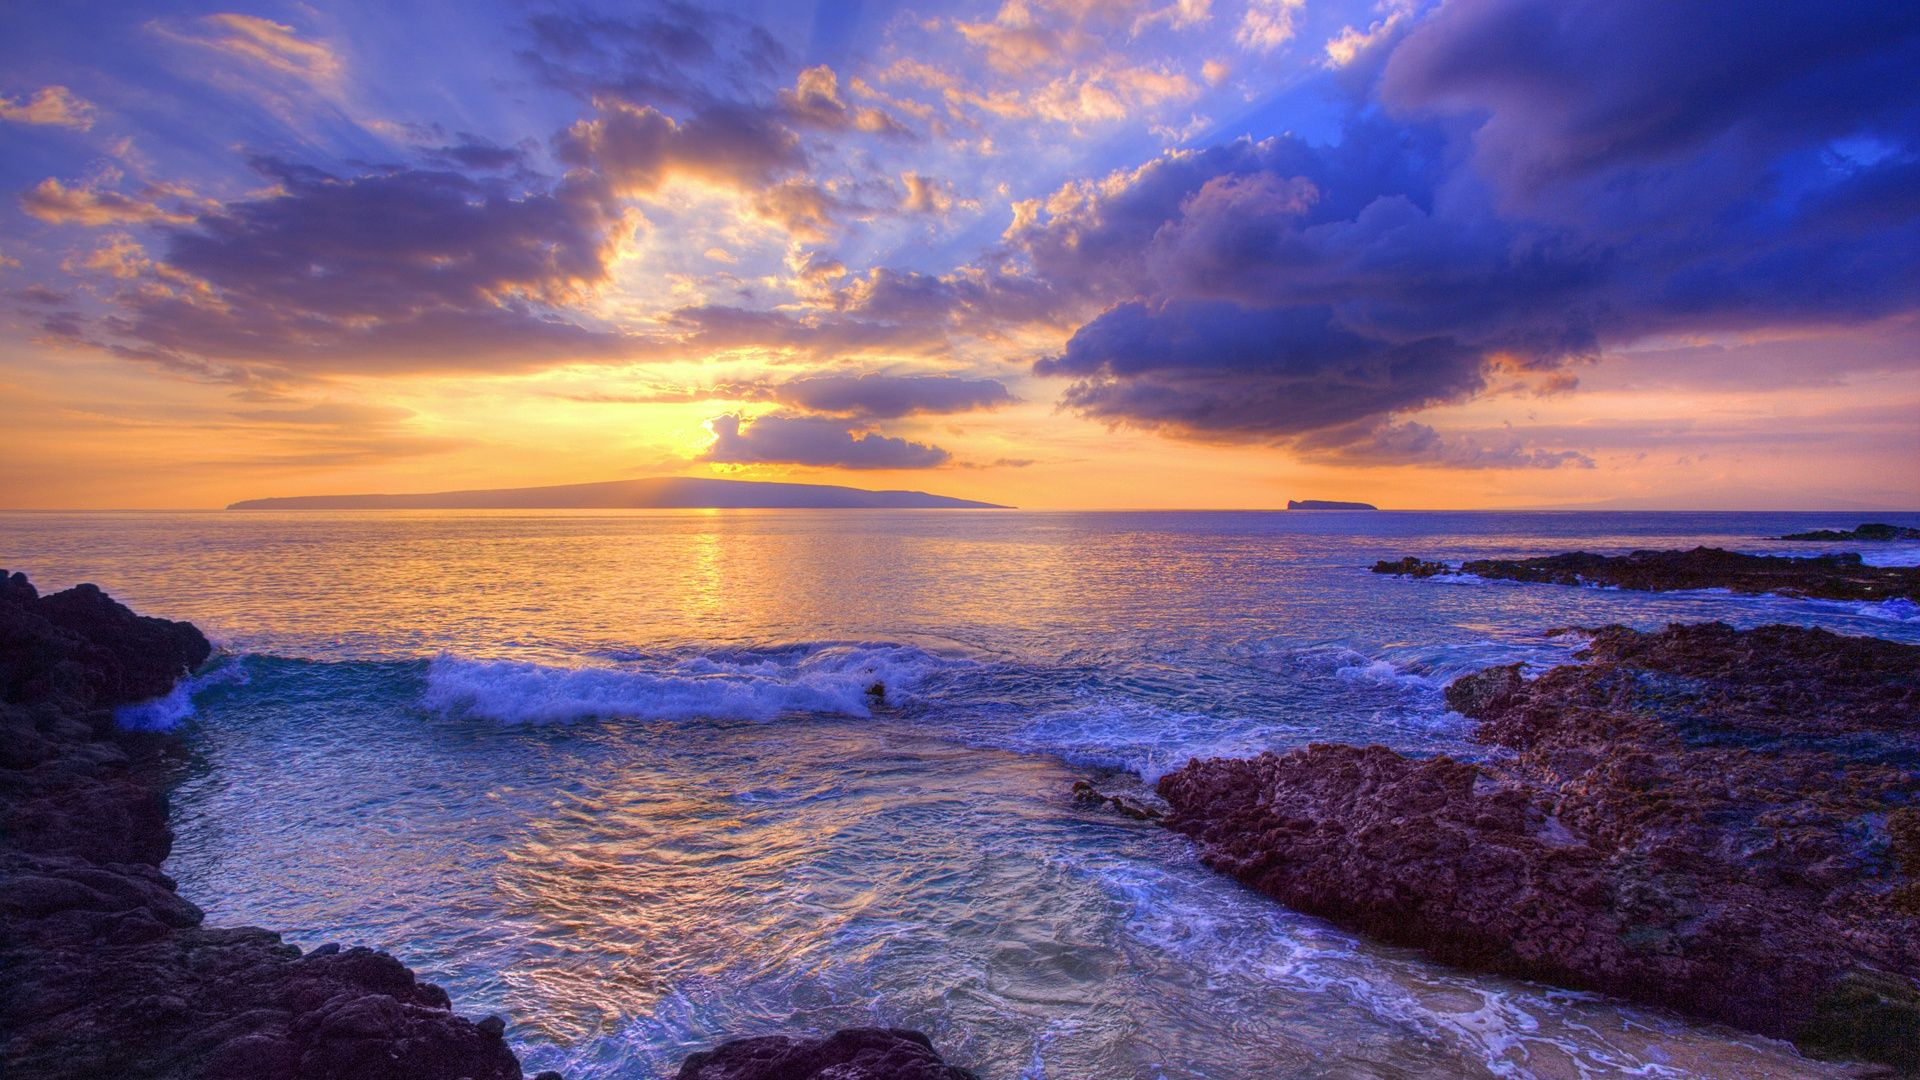 Hawaiian Beach Sunset Wallpaper 秘密のビーチ マウイ島 ハワイ